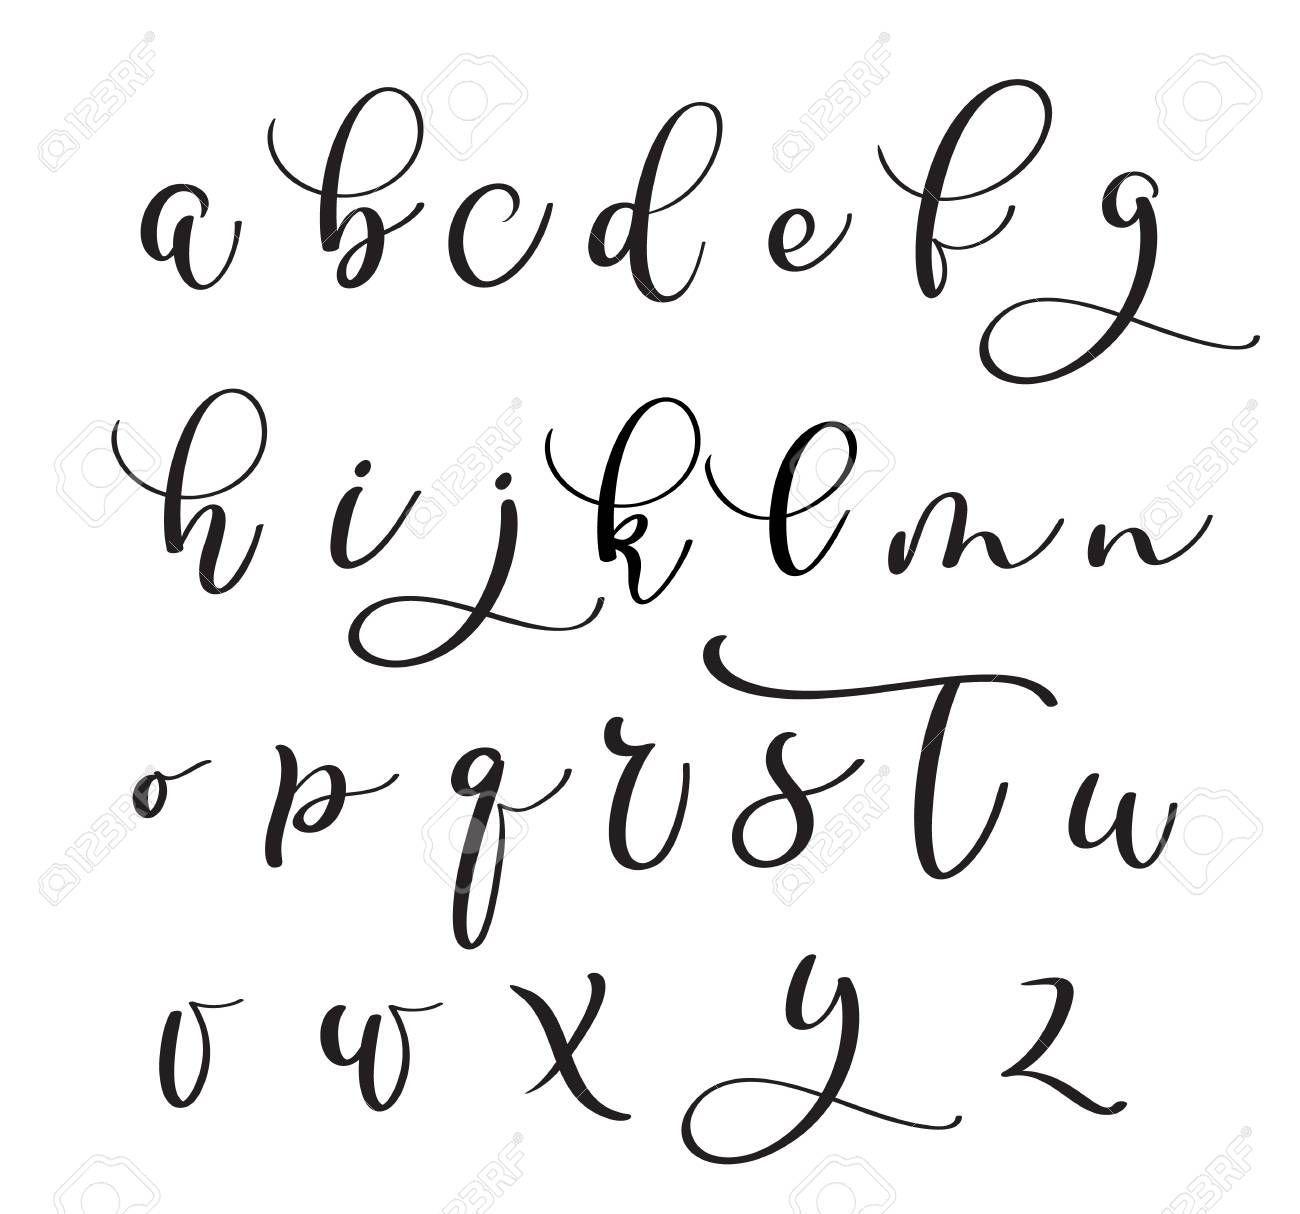 Brushpen Alphabet Modern Calligraphy Handwritten Letters Vector Royalty Free Clipar Lettering Alphabet Calligraphy Handwriting Modern Calligraphy Alphabet [ 1214 x 1300 Pixel ]